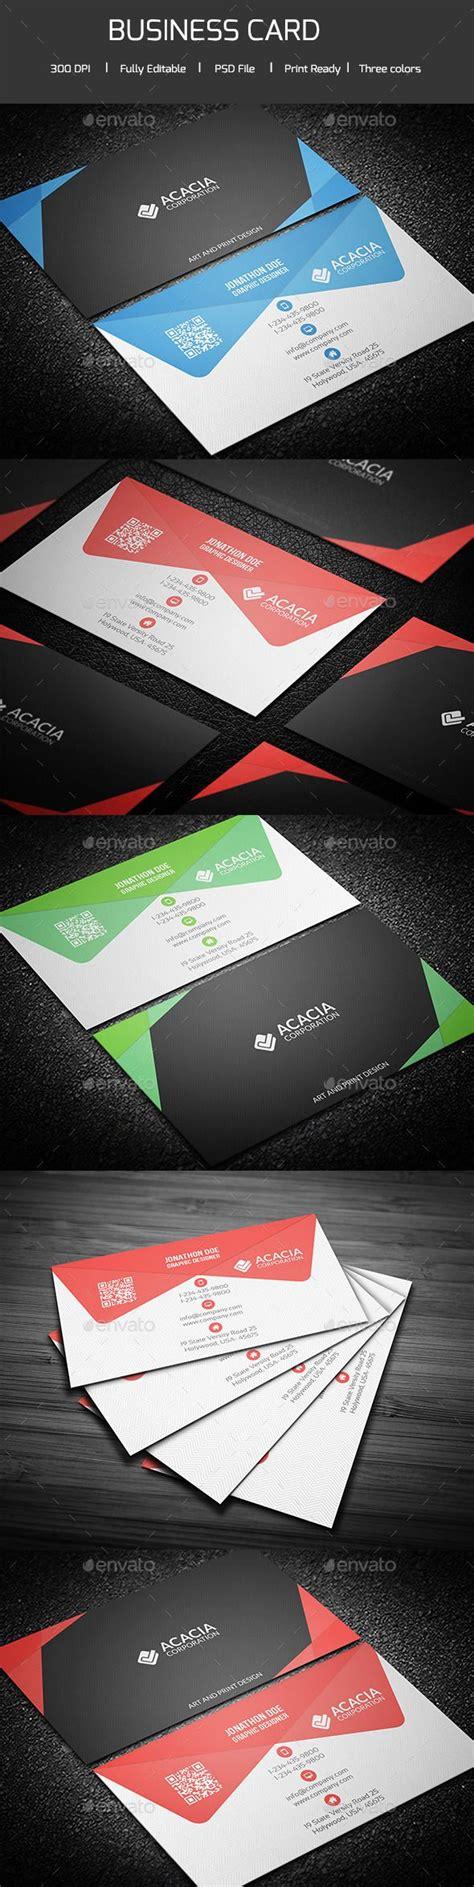 free 2 x 3 1 2 business card template creative business card template design http